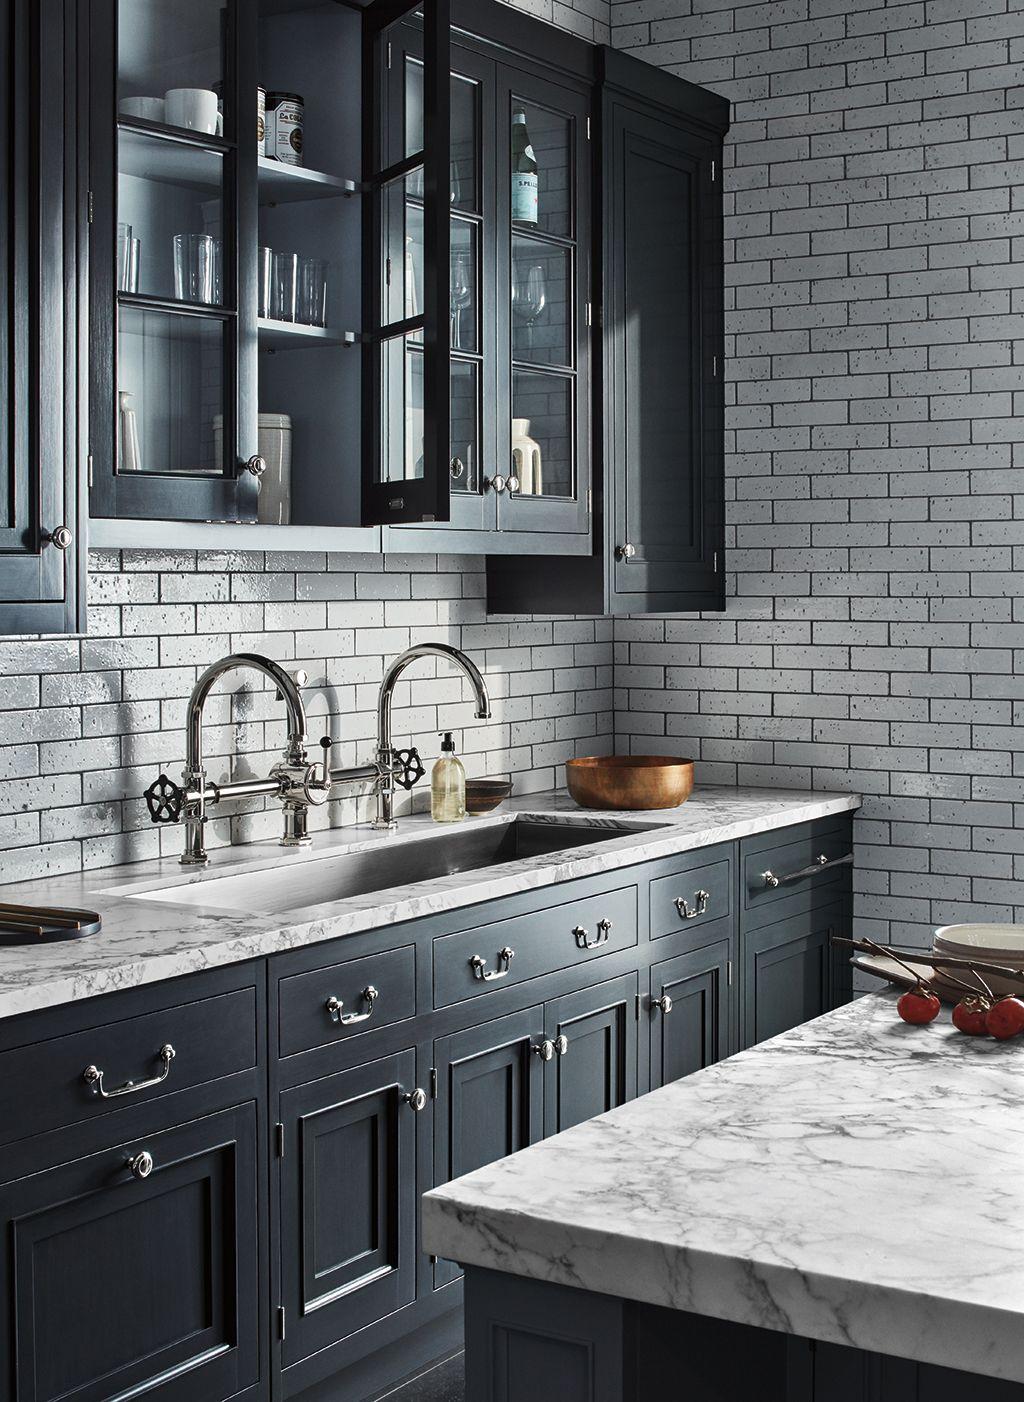 Cabinetry Collections Waterworks Waterworks Kitchen Inspiration Design Kitchen Interior Home Kitchens